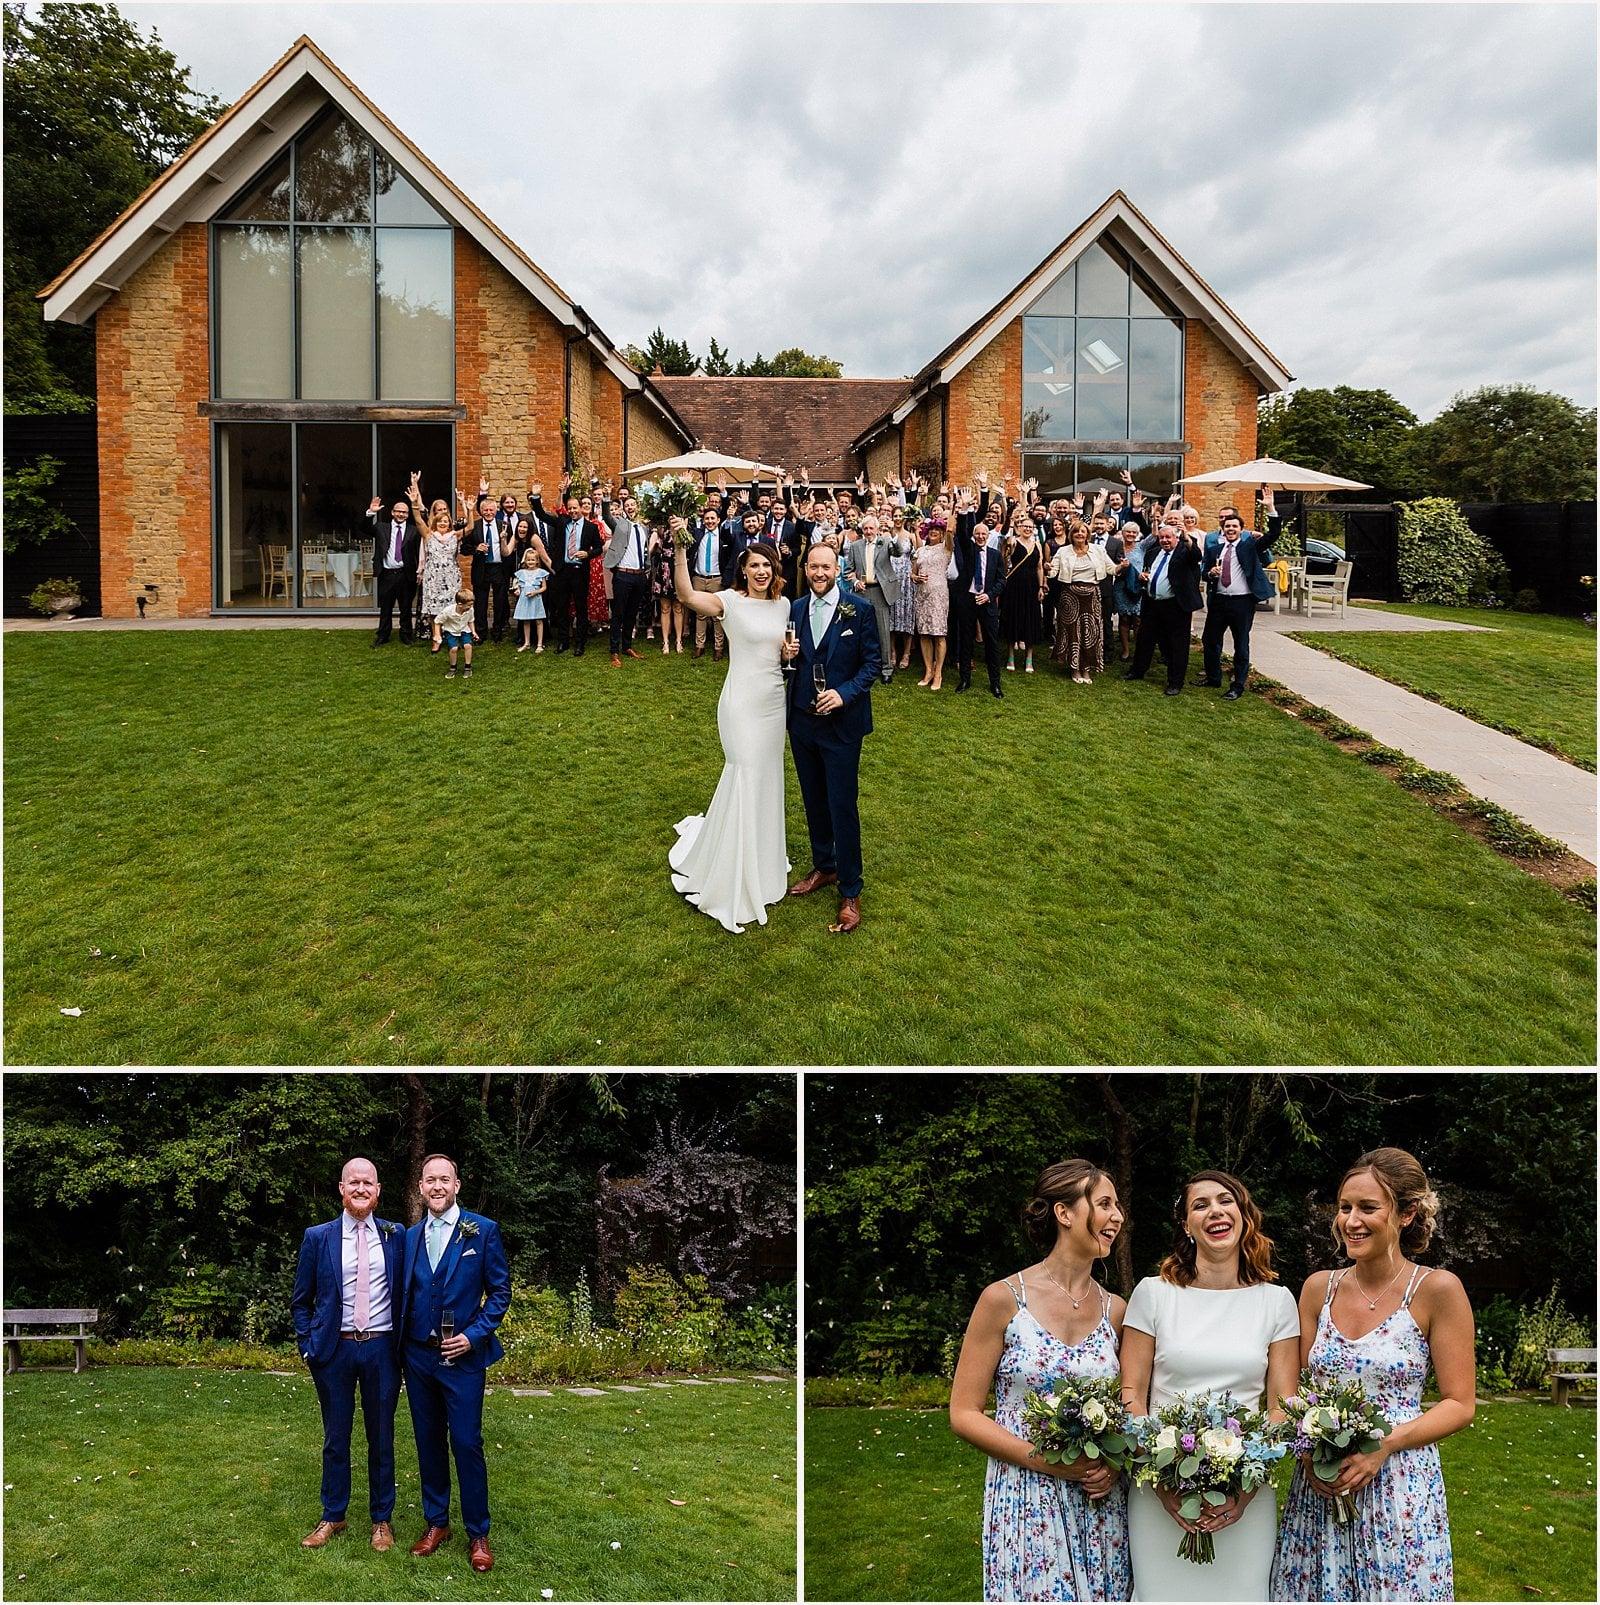 Millbridge Court Wedding - stunning summer wedding - wedding photography 41